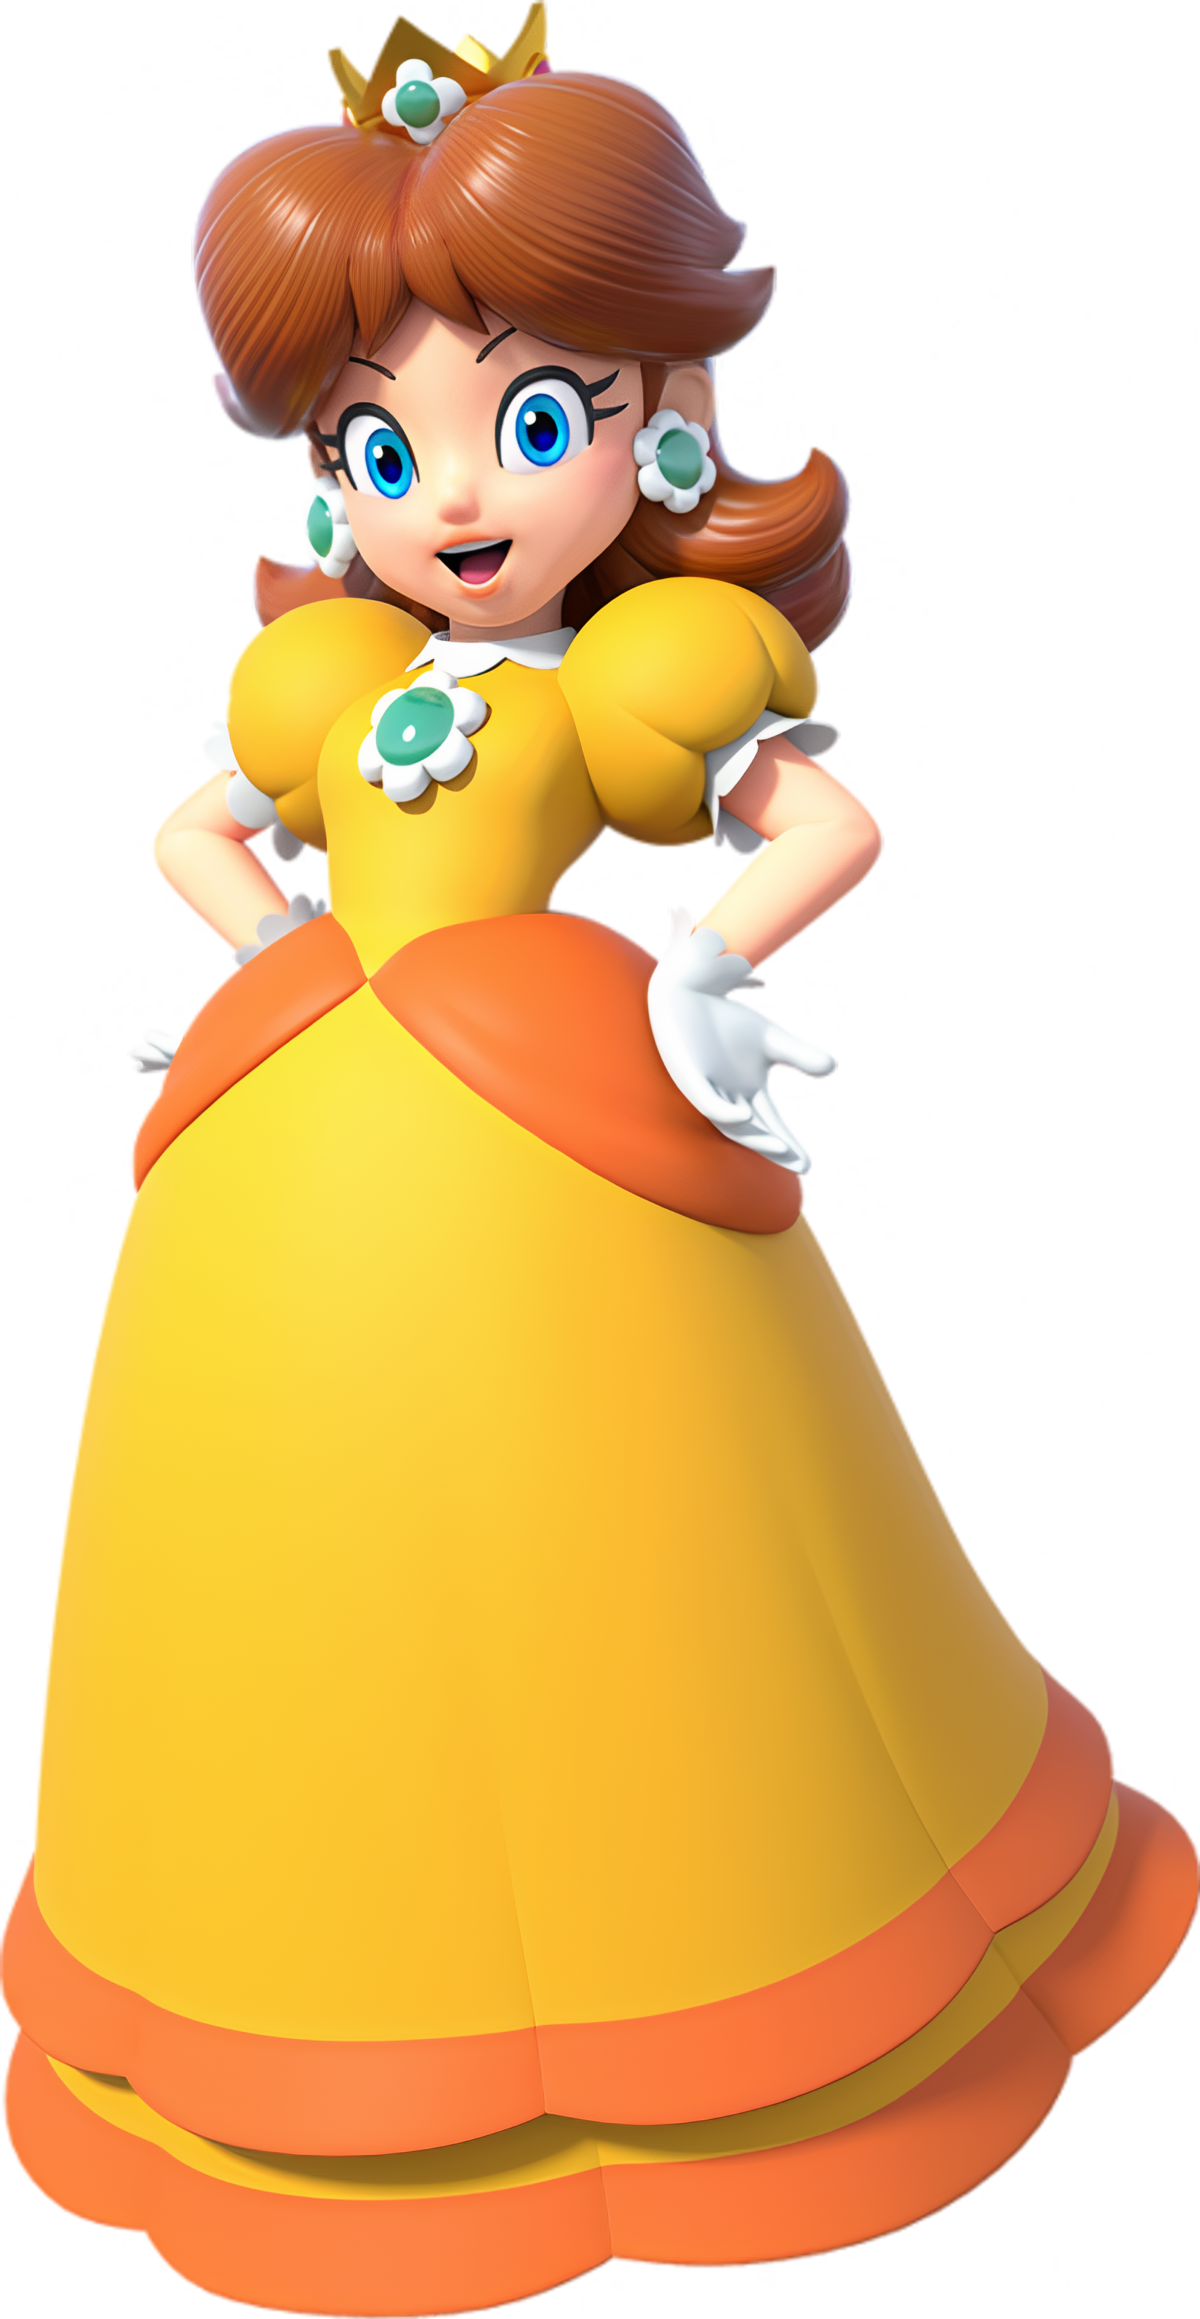 Nackt princess daisy Gallery:Princess Daisy